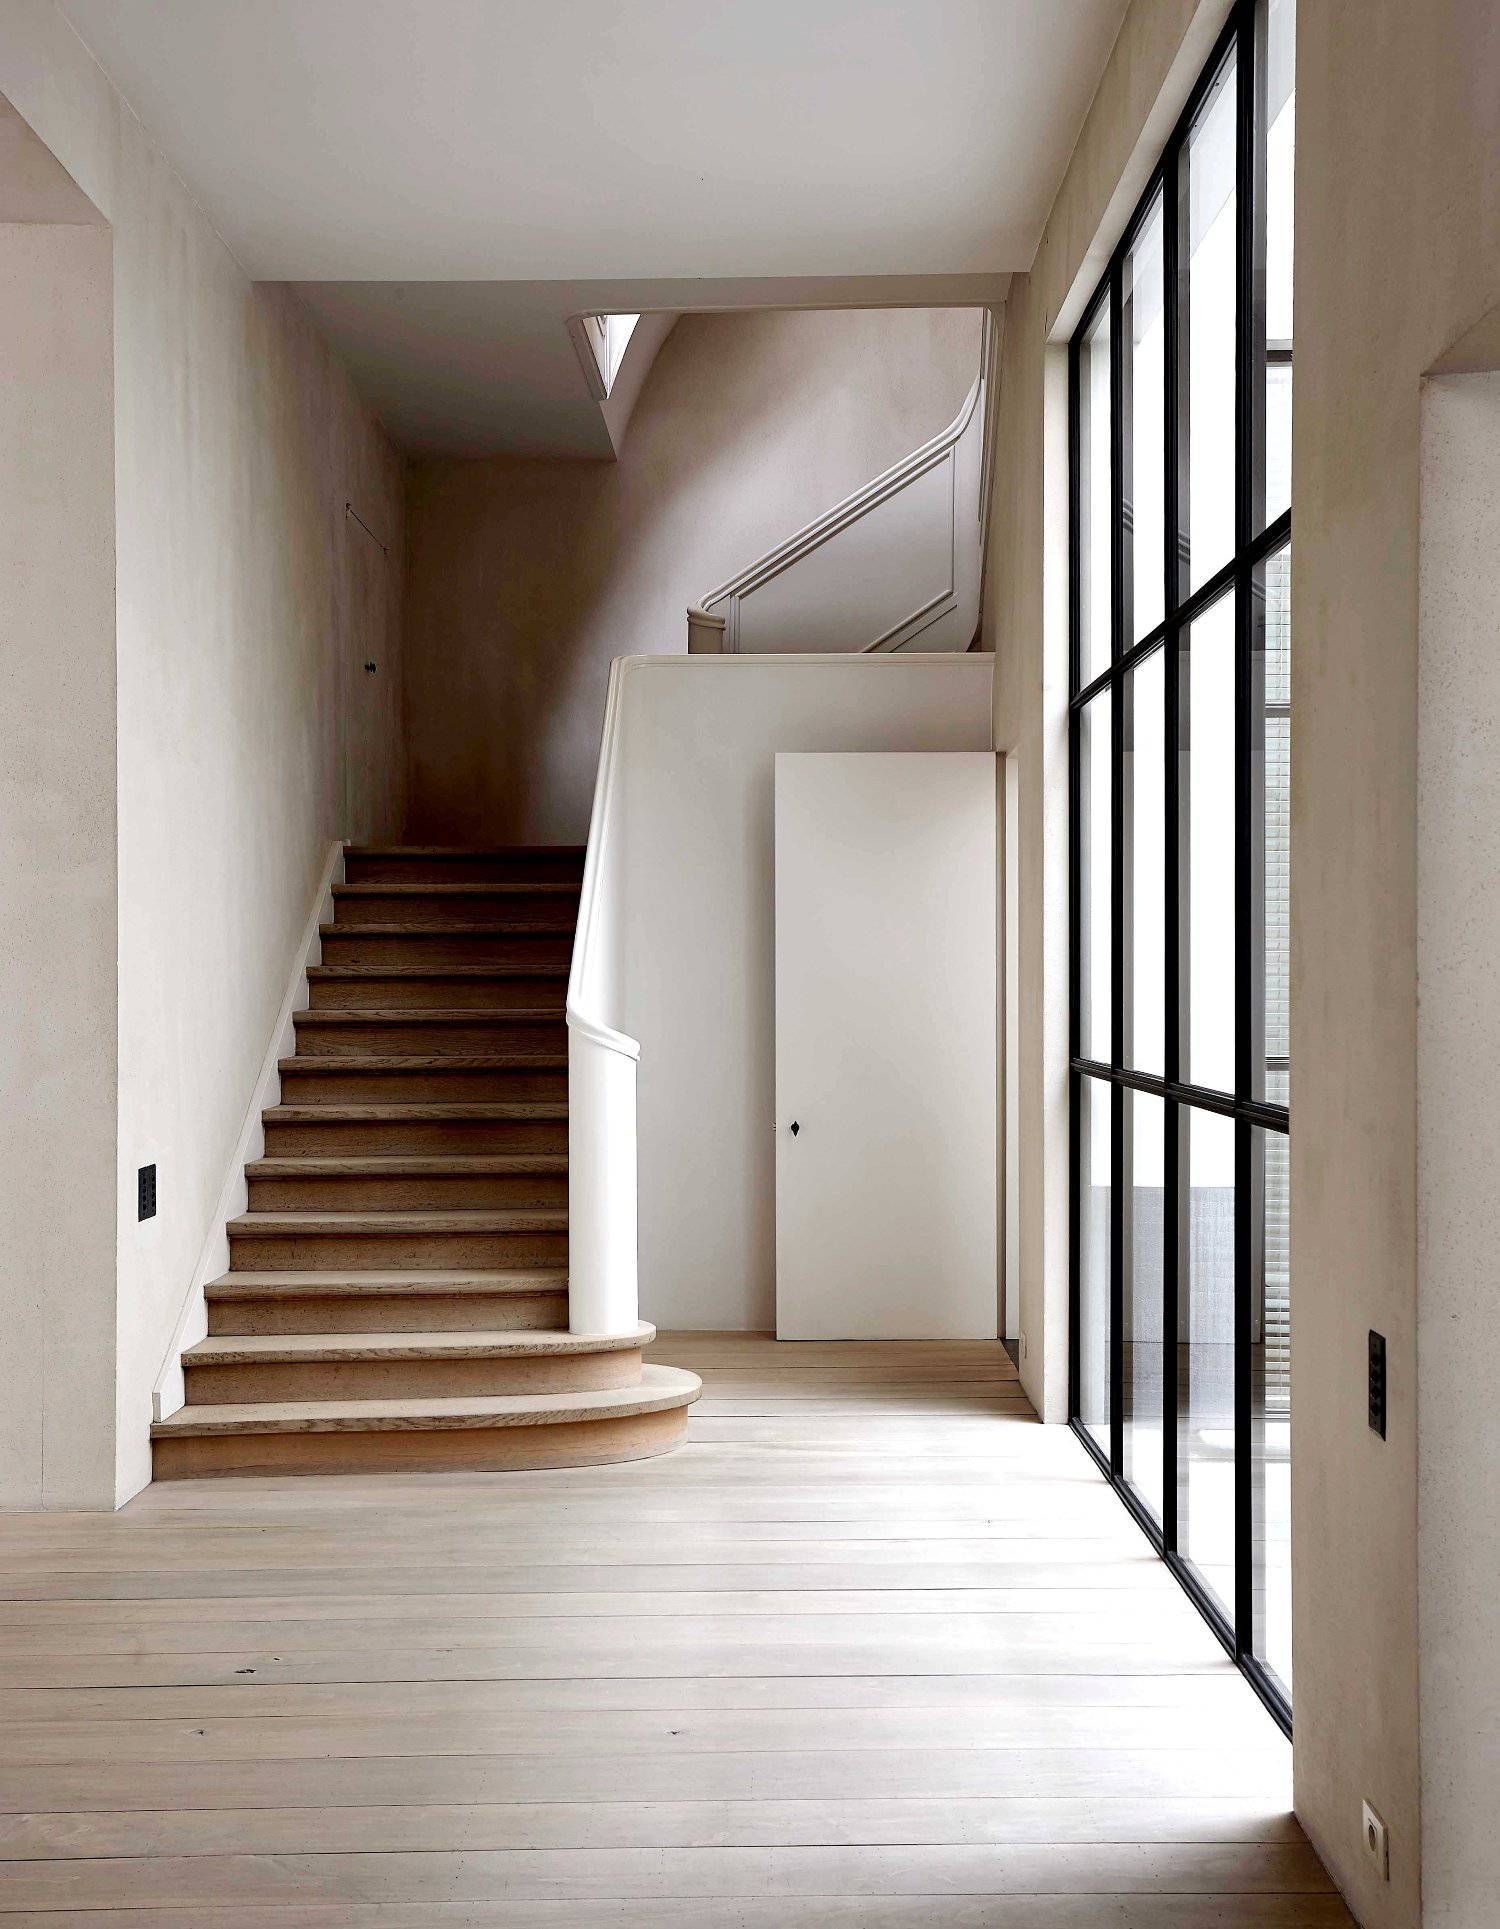 Vincent Van Duysen VVDll Residence (1)